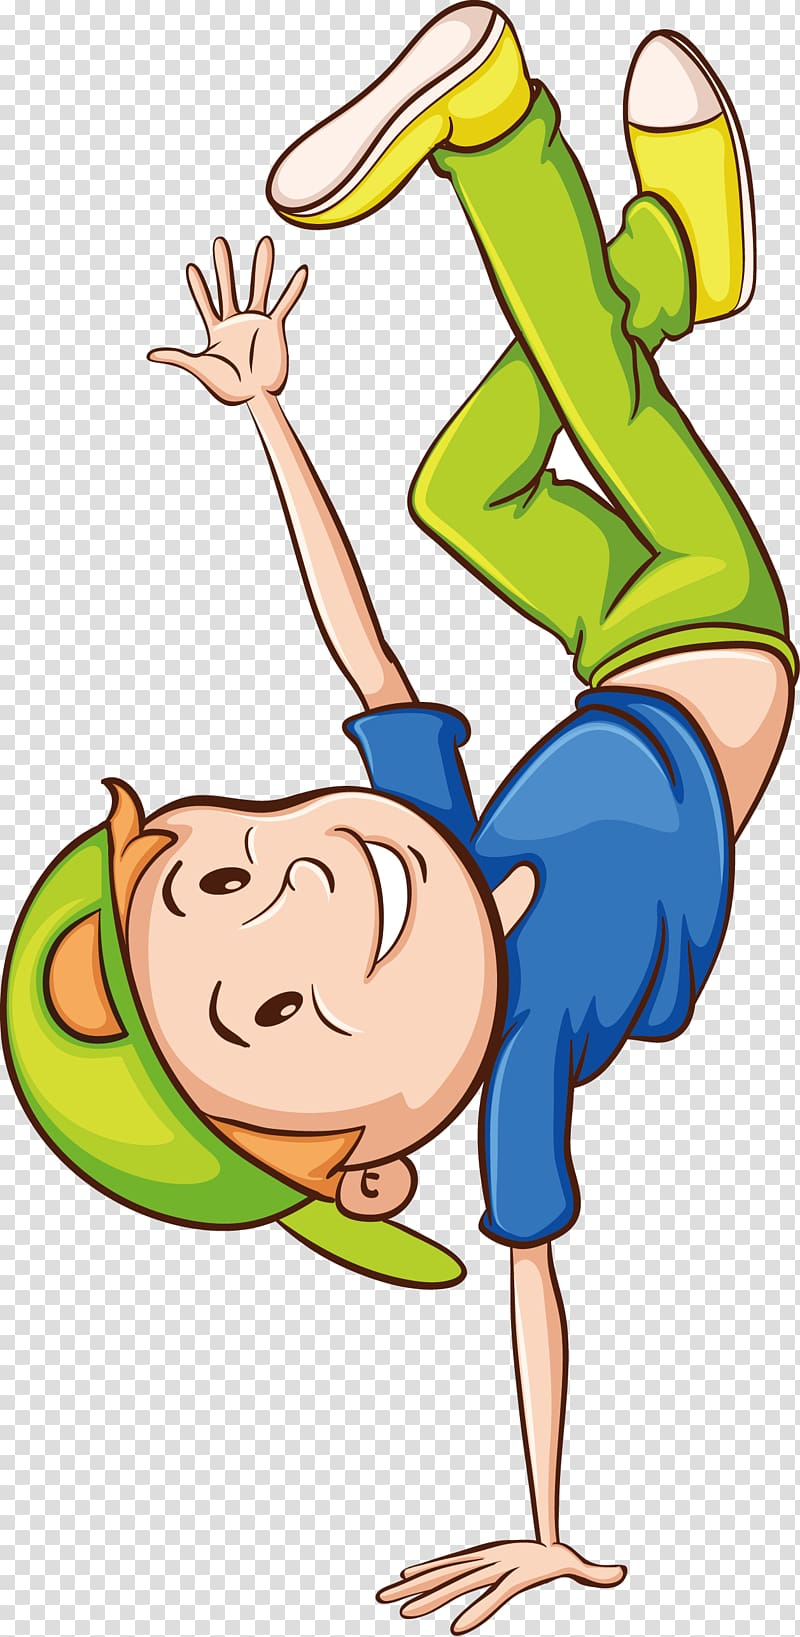 Hip hop dance child. Clipart globe dancing